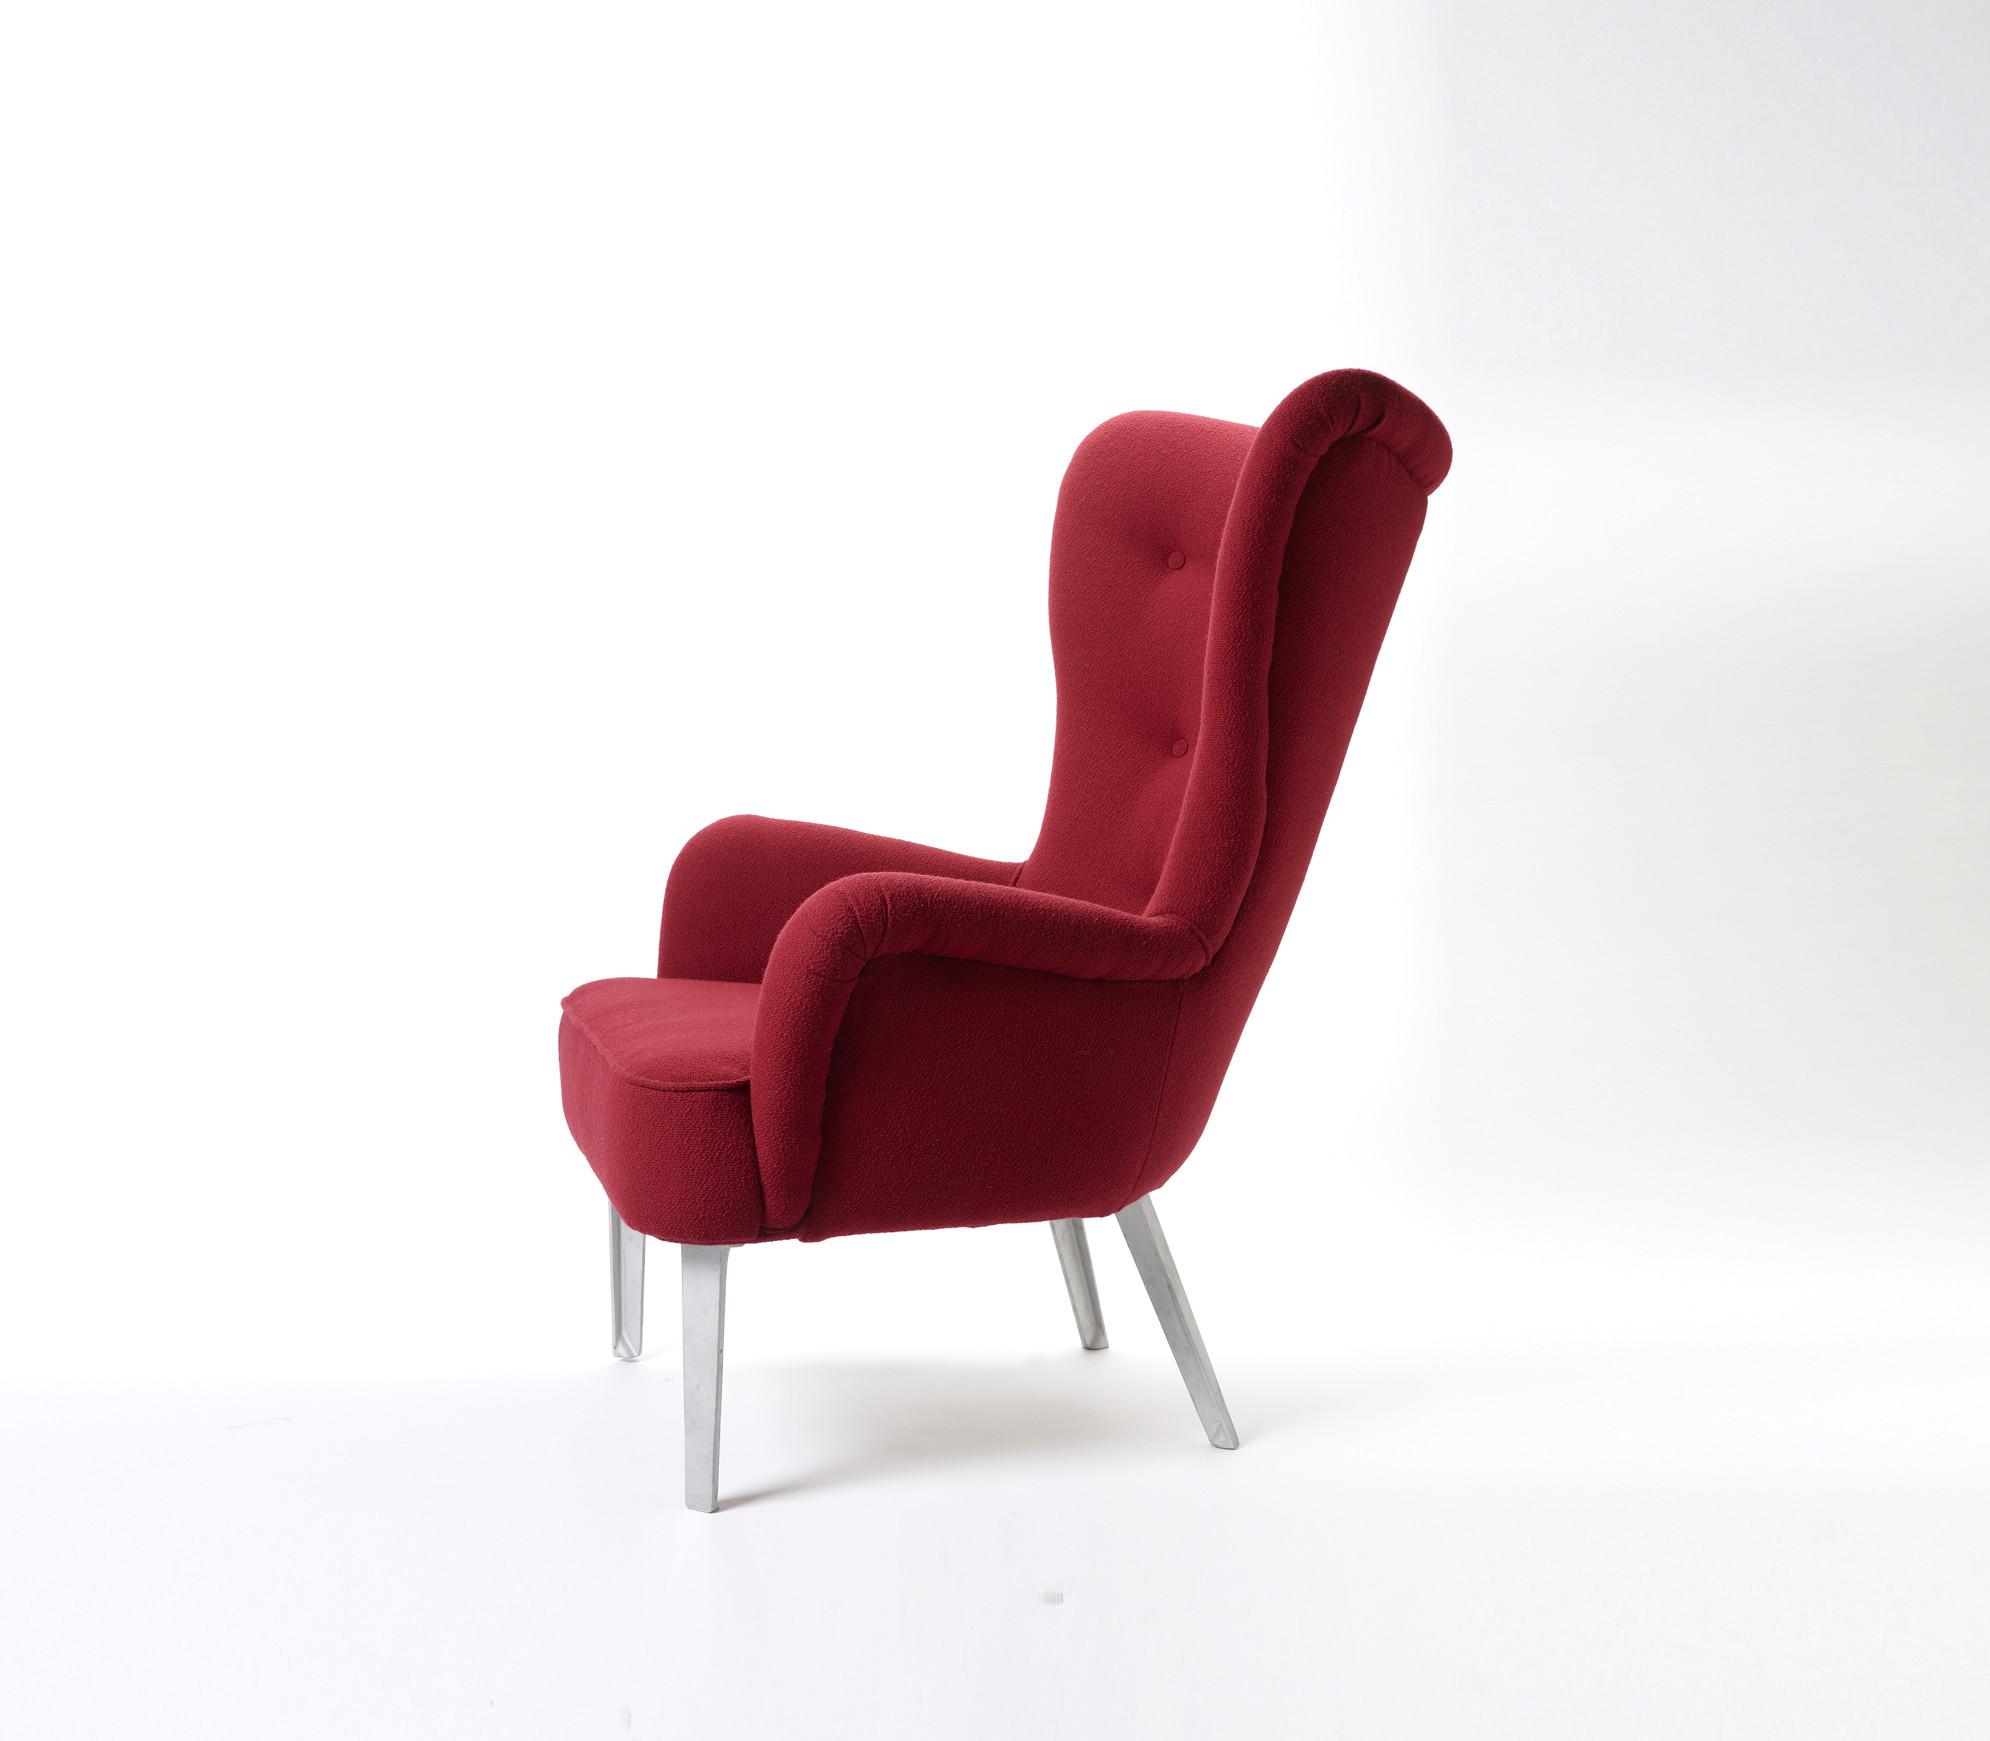 DA 1 Chair